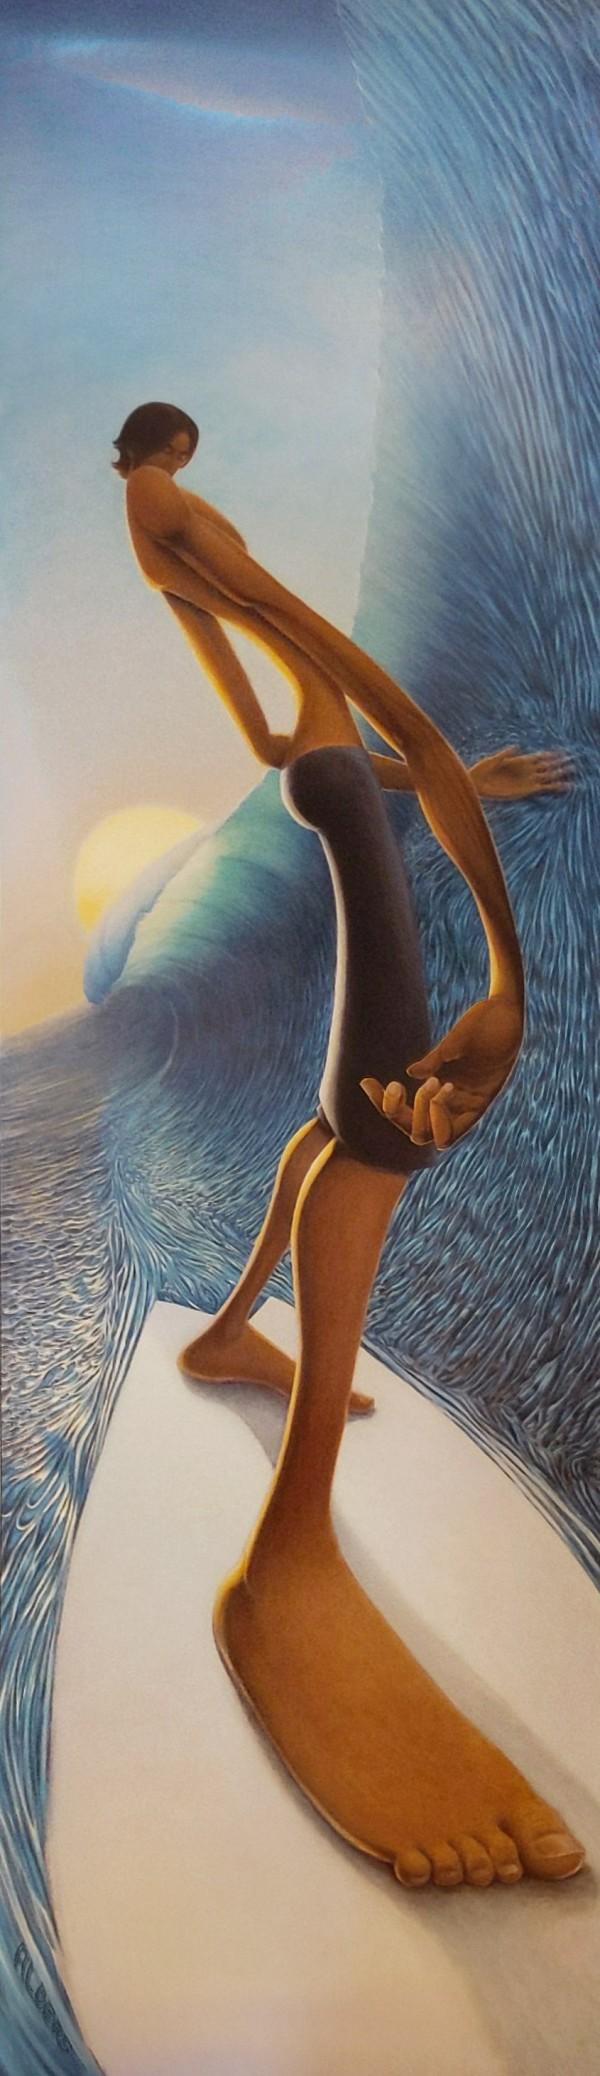 Surfer* by Jay Alders